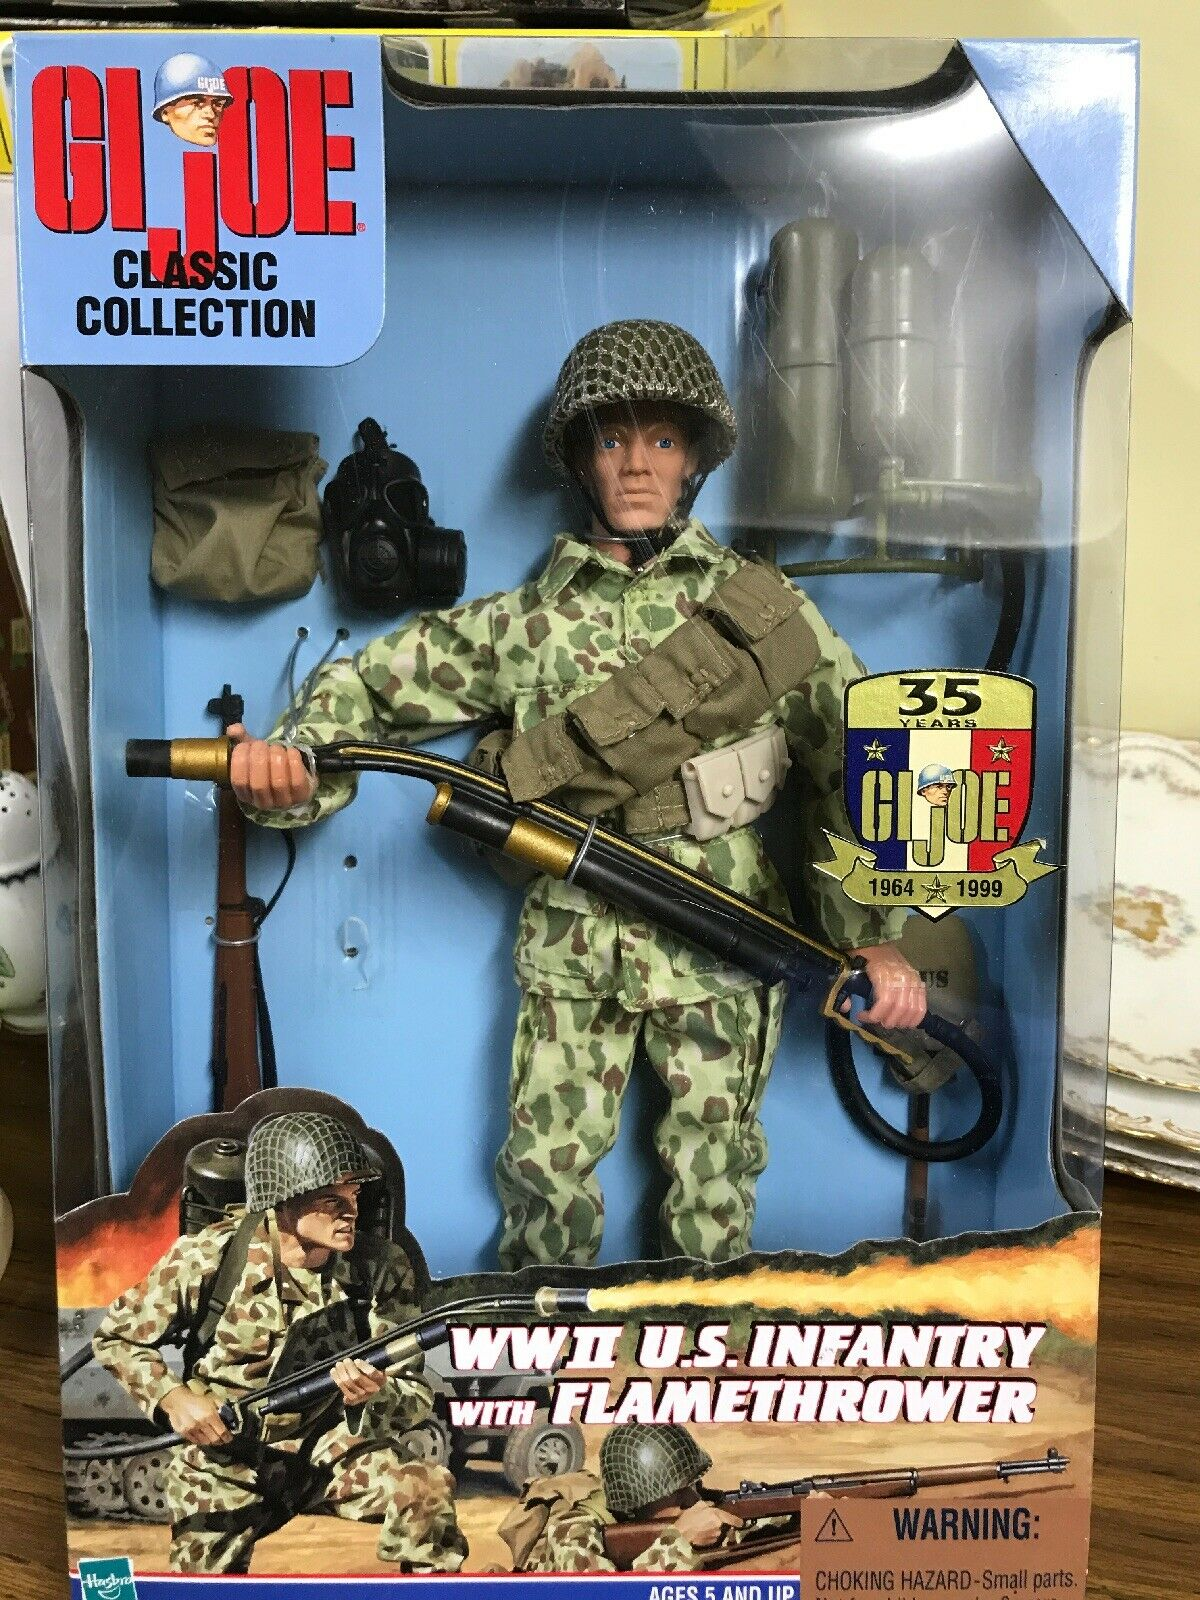 GI Joe Classic Collection - WWII U.S. Infantry With Flamethrower - NIB